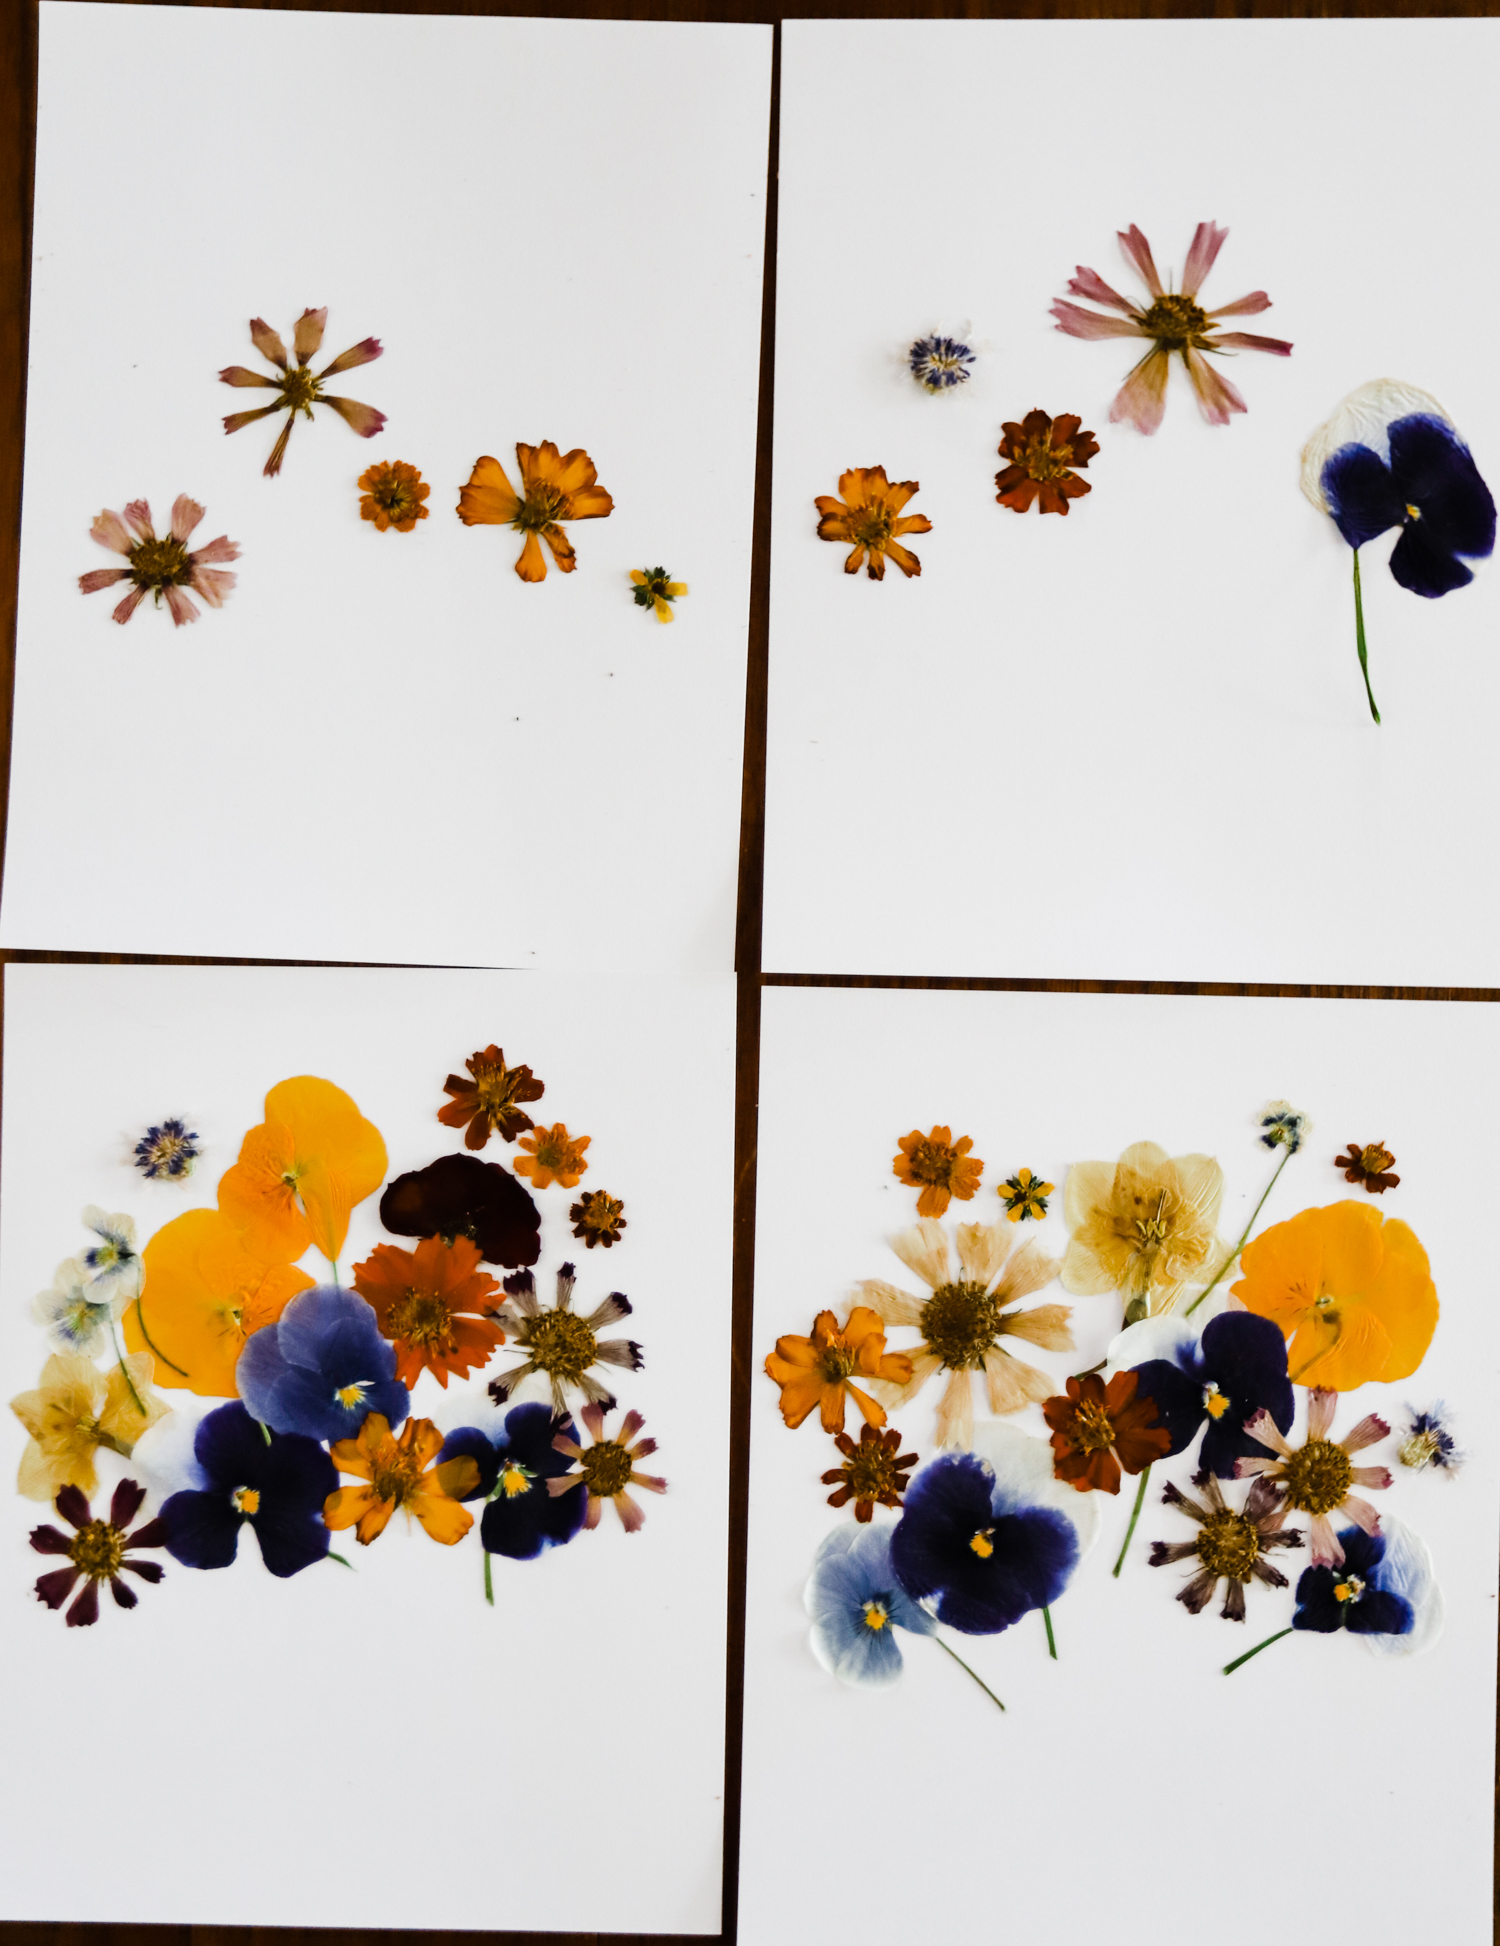 pressed-flower-art-2-WEB-1.jpg